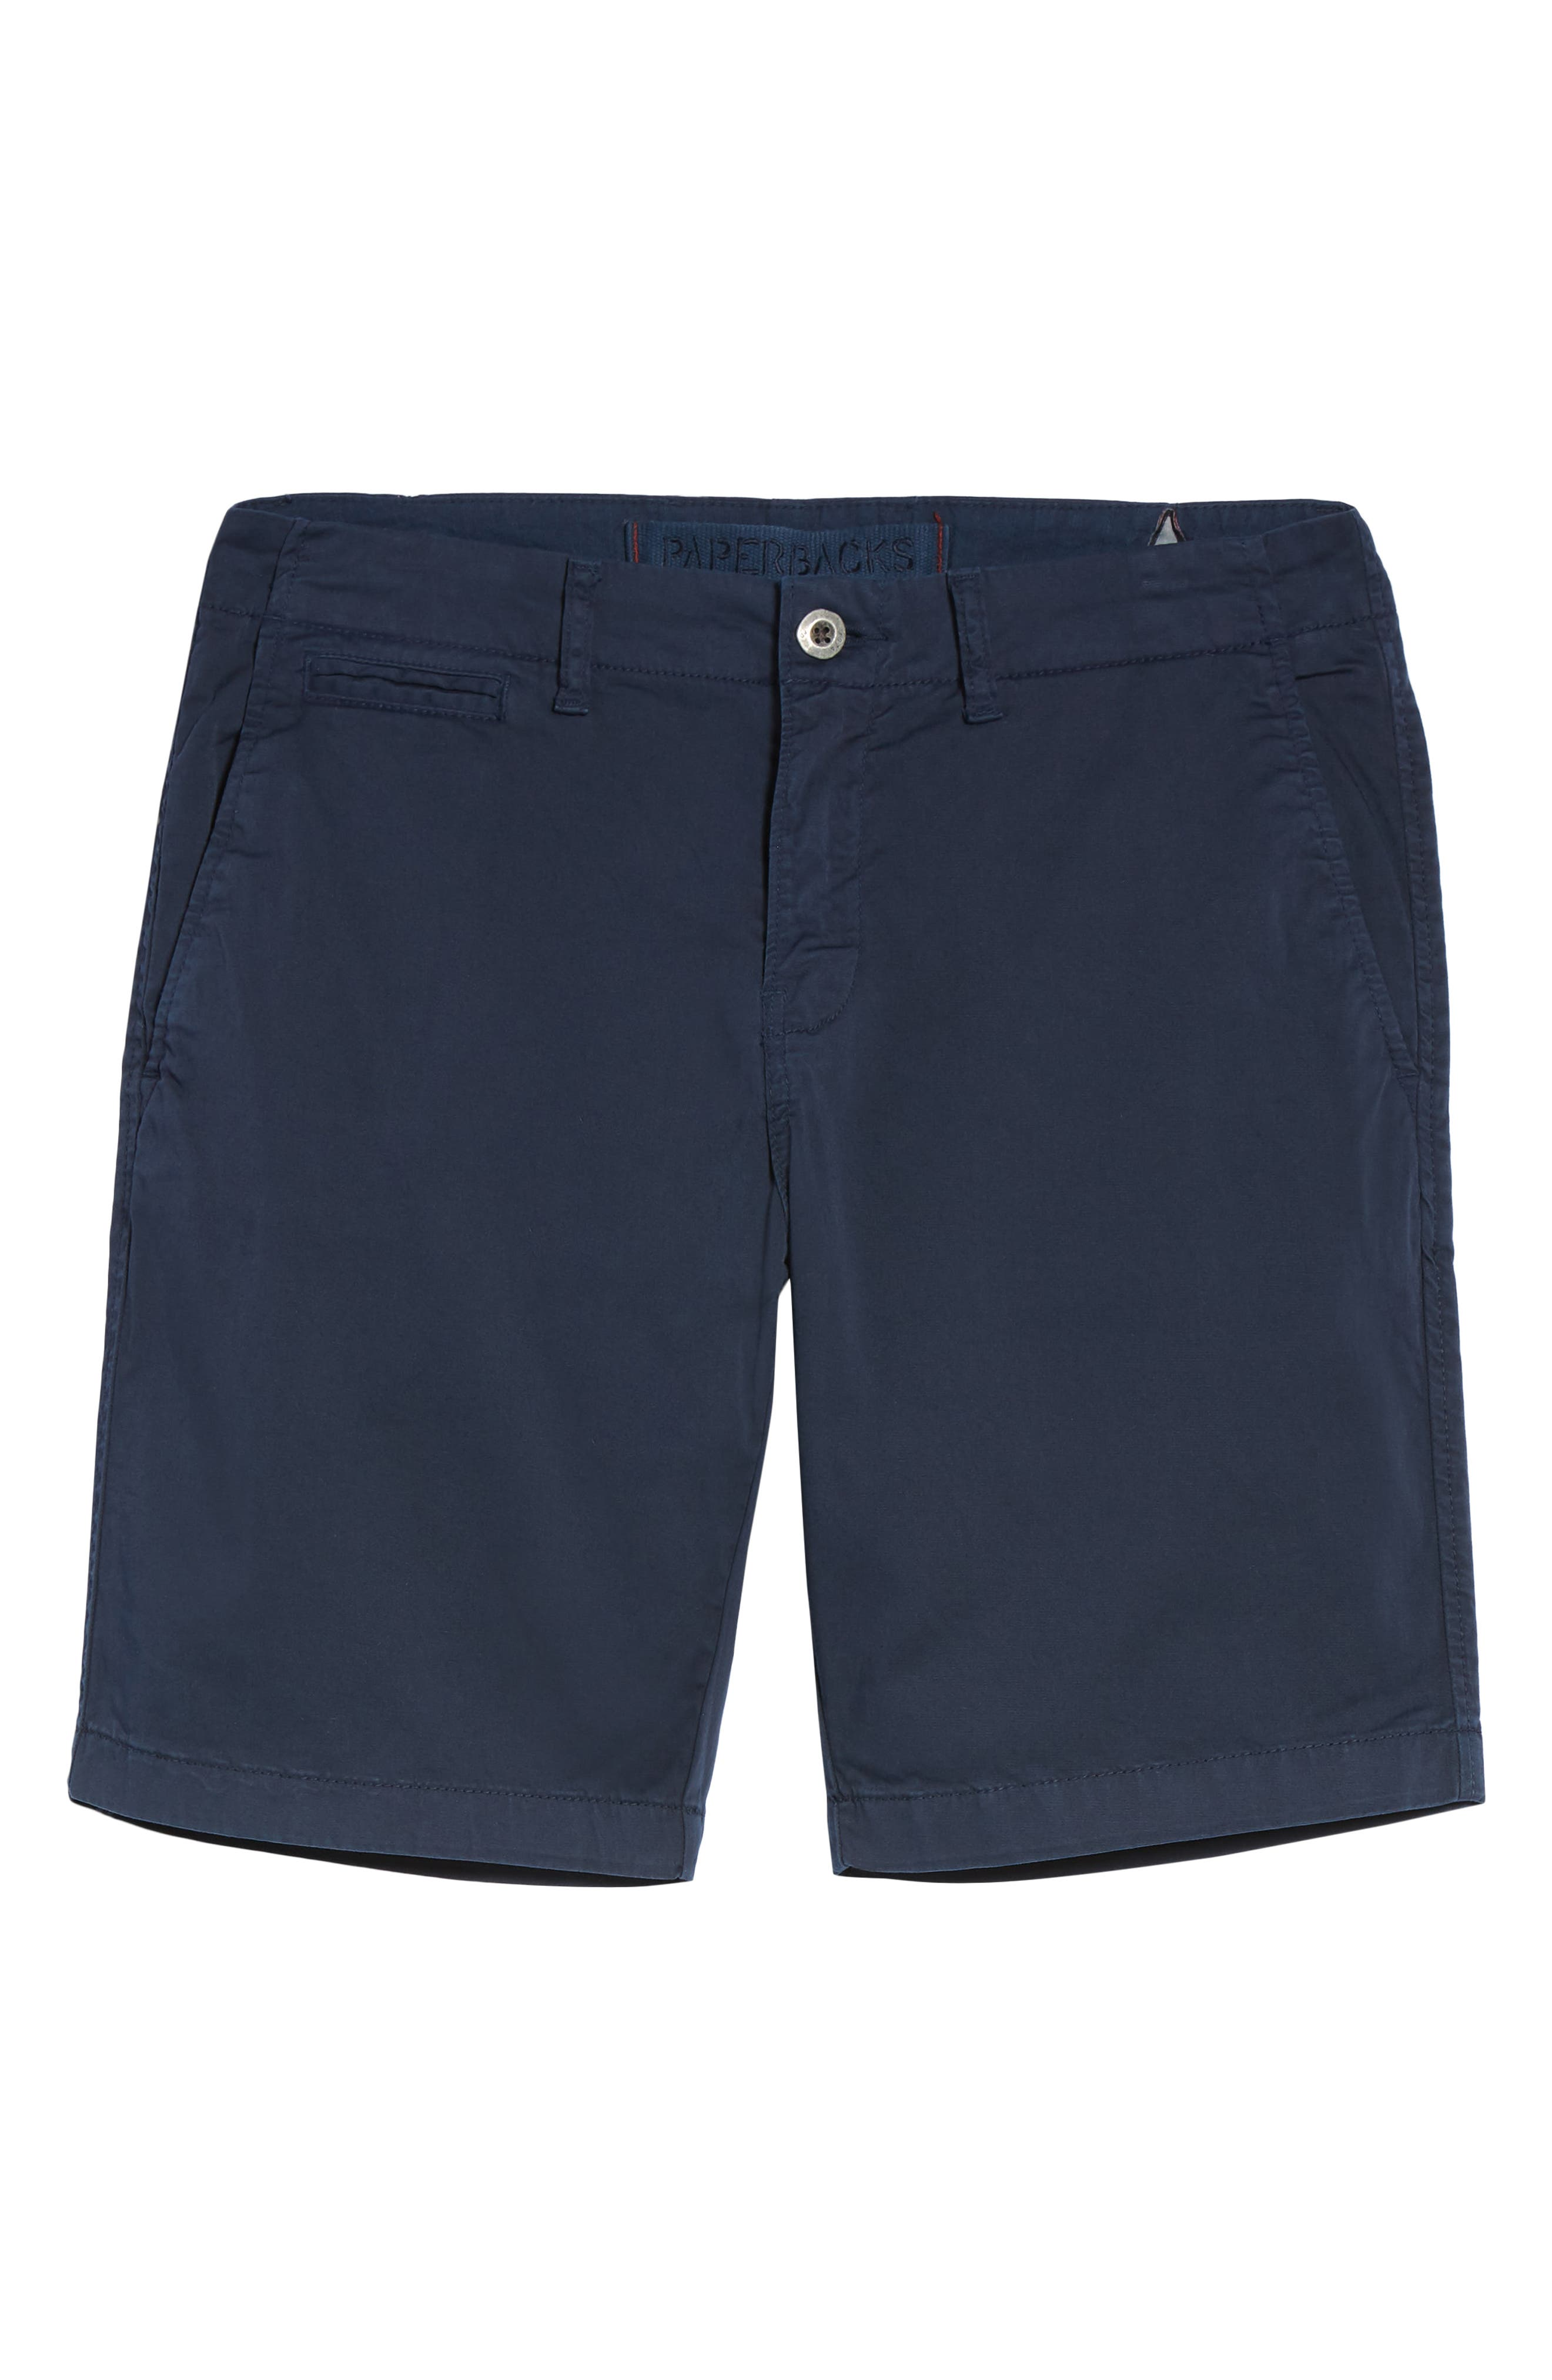 St. Barts Twill Shorts,                             Alternate thumbnail 69, color,